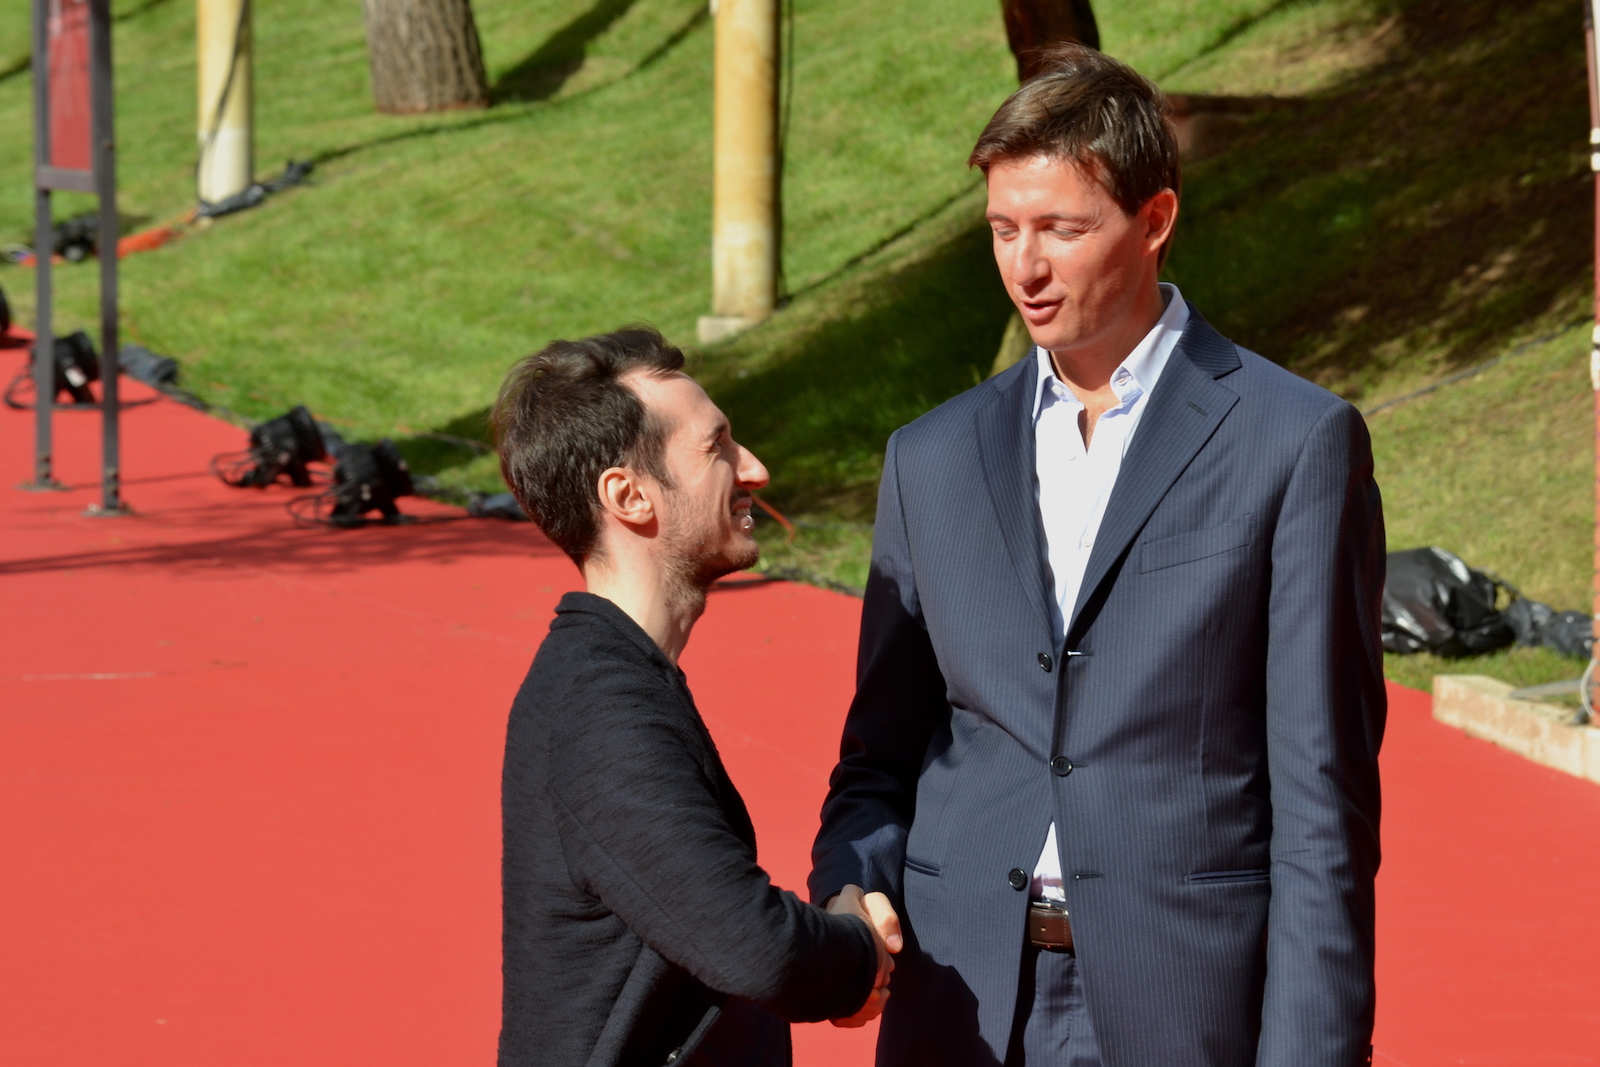 Roma 2015: Stefano Bethlen e Luca denaro sul red carpet di Inside Out